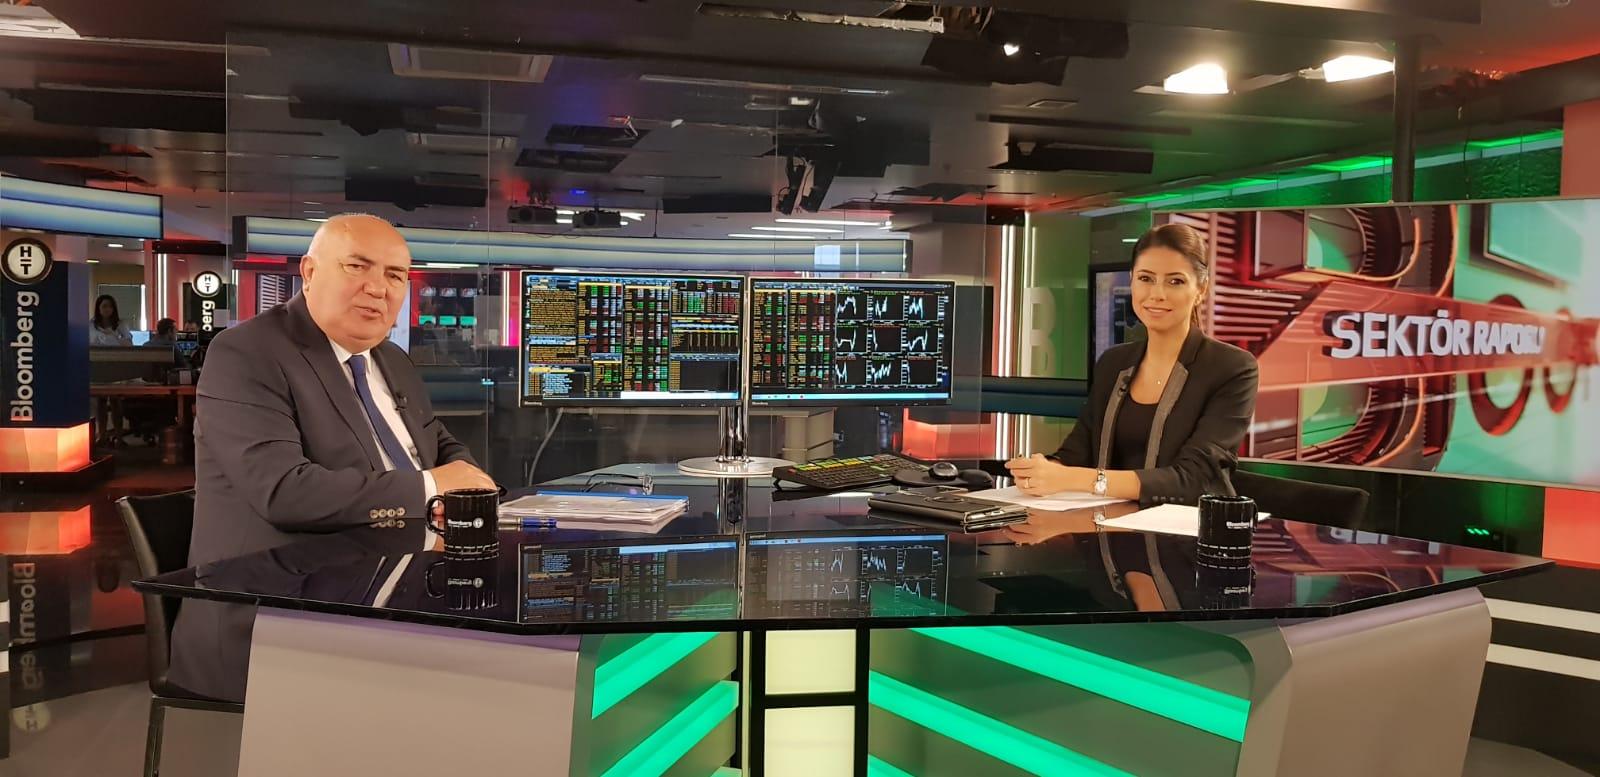 istanbul-perder-baskani-ramazan-ulu-bloomberg-tv-kanali-sektor-raporu-program-ozeti